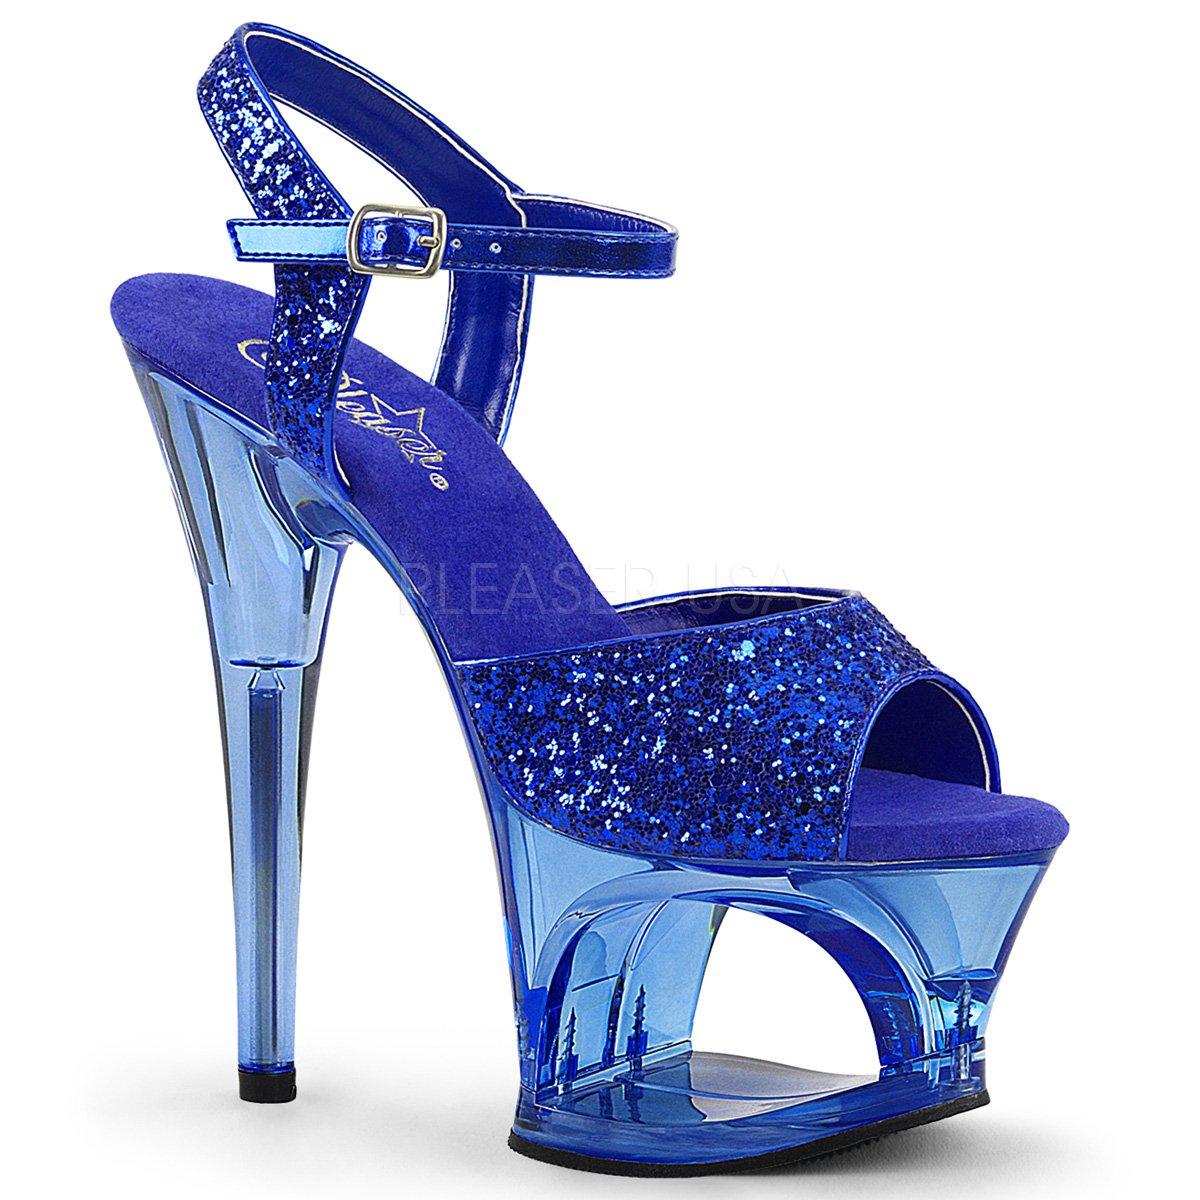 Pleaser Damen Moon-728 Offene Sandalen Blau Glitter/Blau Tinted